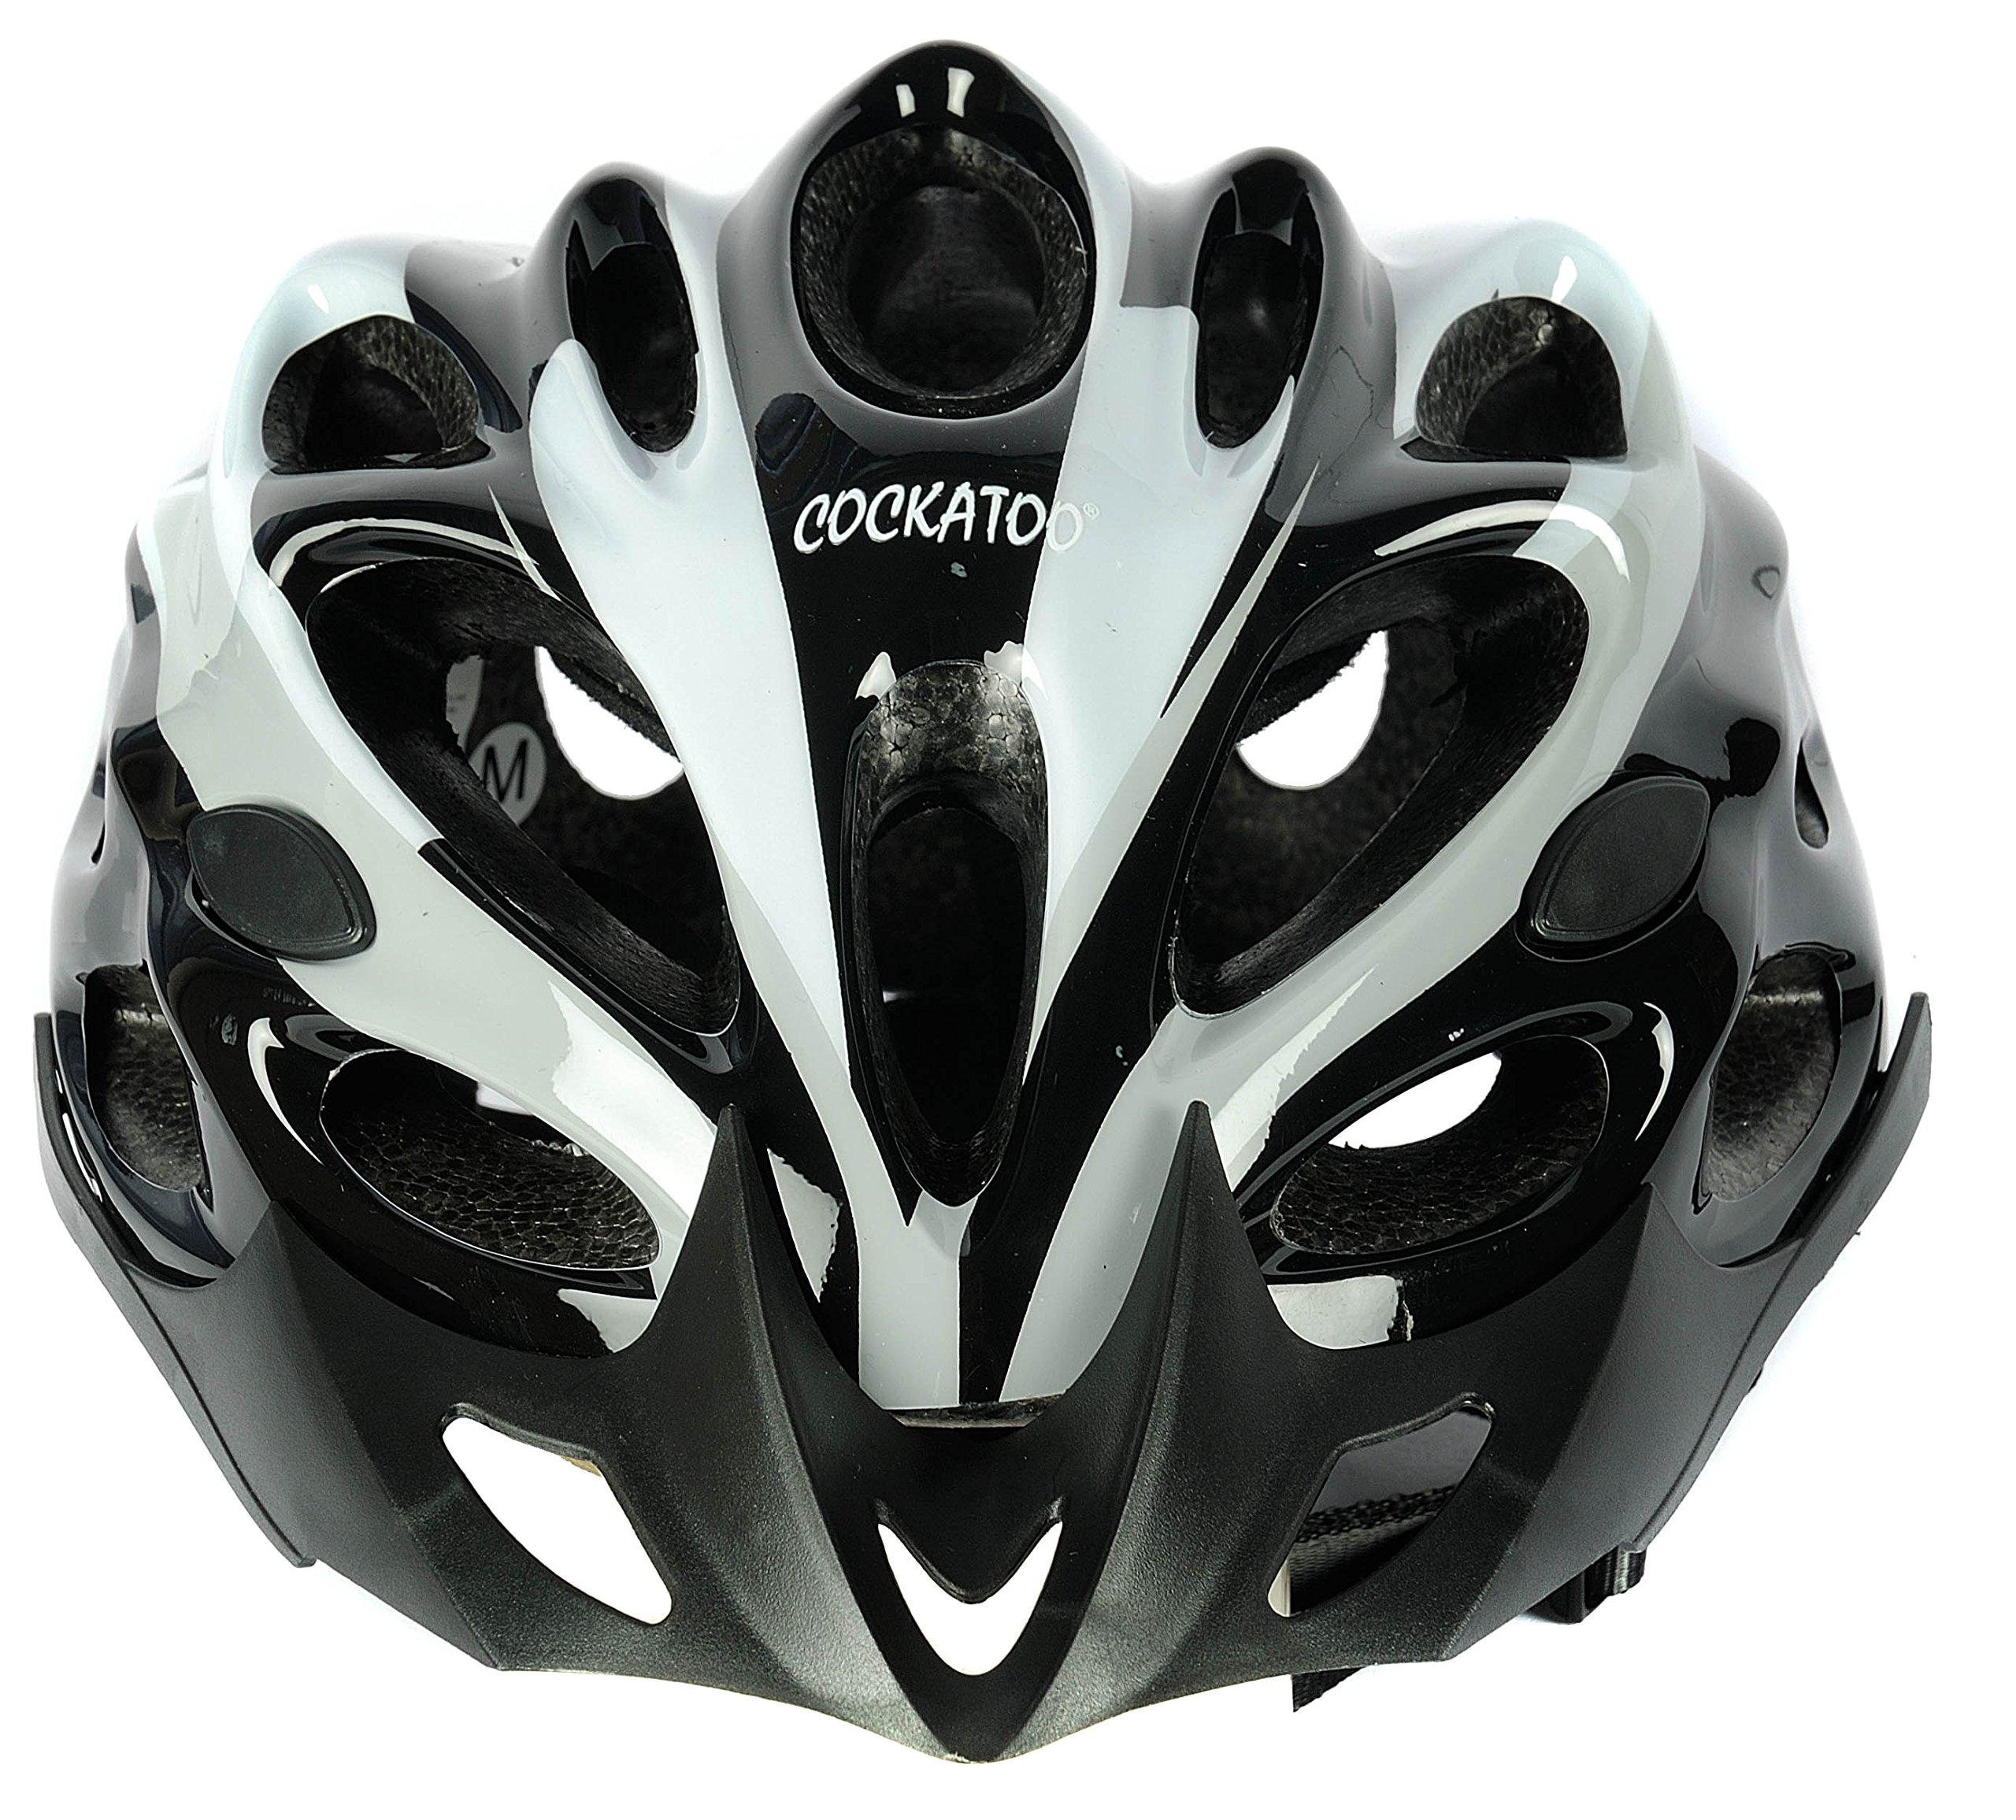 Cockatoo CPH Polypropylene Cycling Helmet, Small (White/Black) (B0721G2XC6) Amazon Price History, Amazon Price Tracker